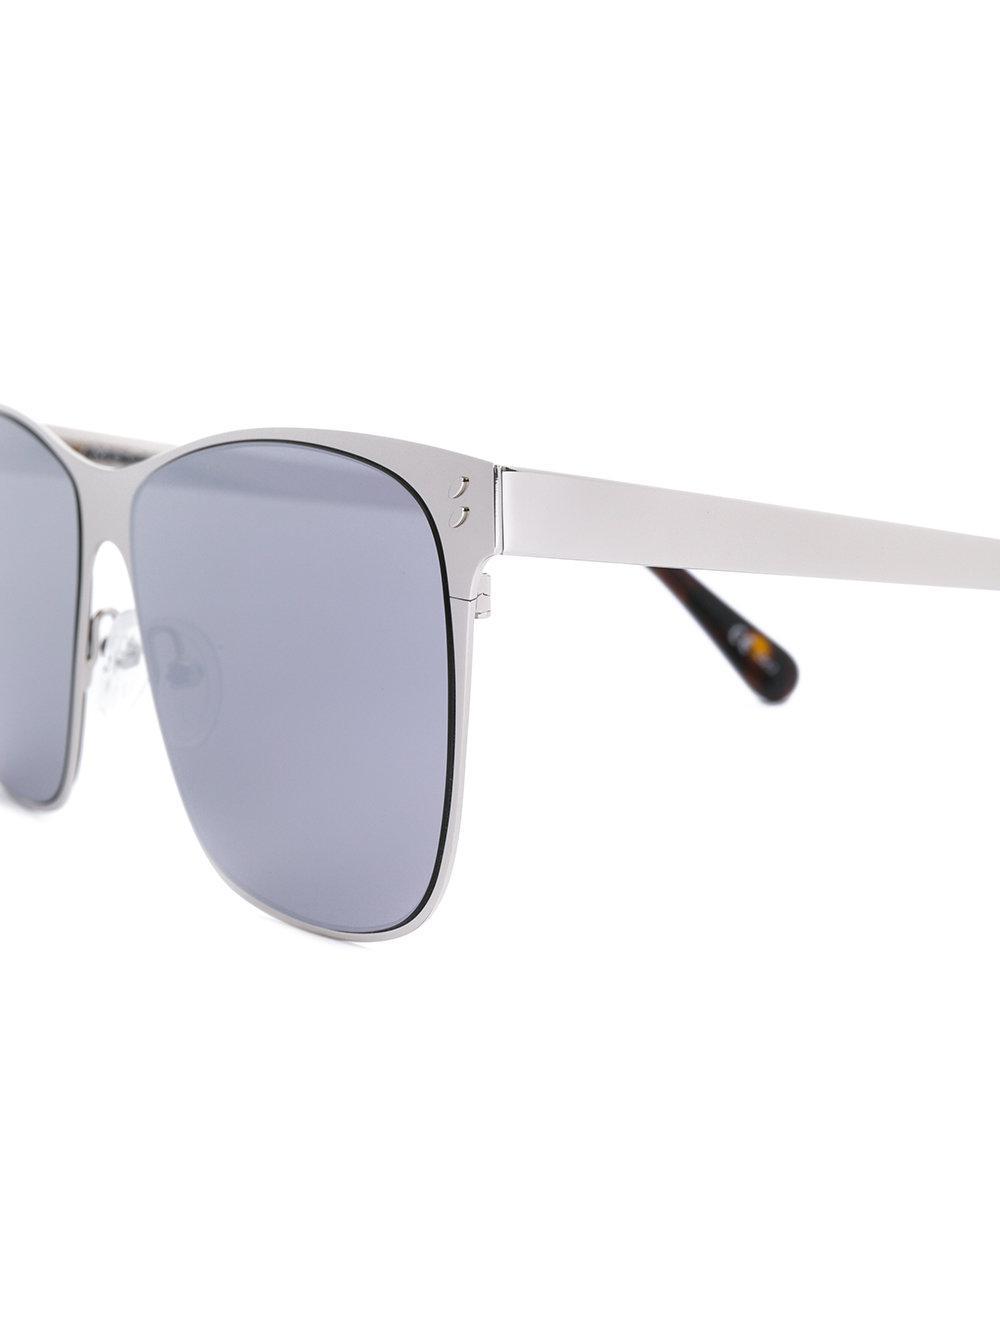 Stella McCartney Square Frame Sunglasses in Metallic